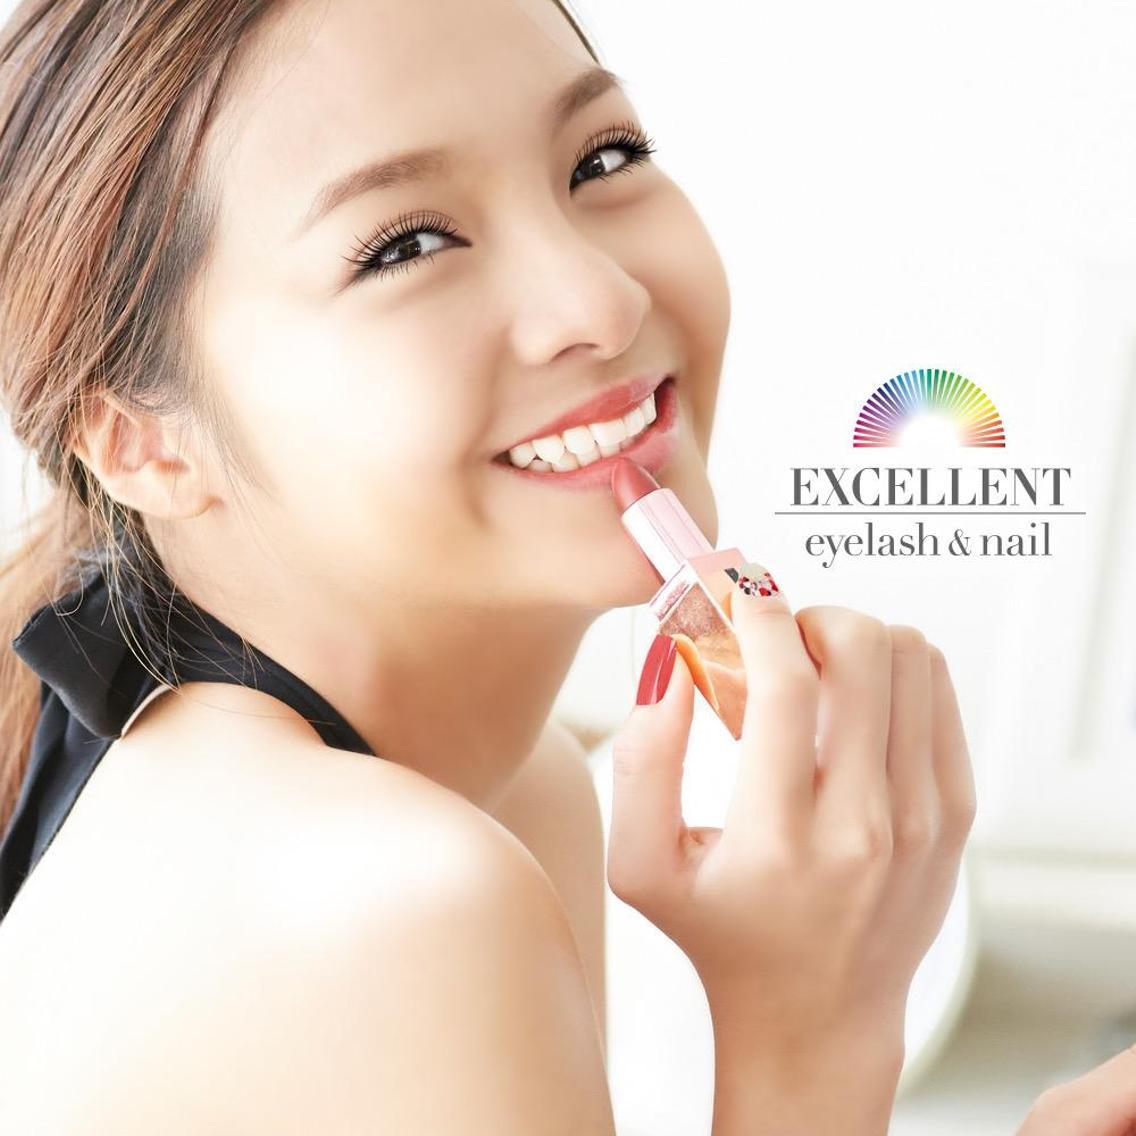 EXCELLENT eyelash&nail アミュプラザ店所属・ エクセレント脱毛(脱毛)の掲載